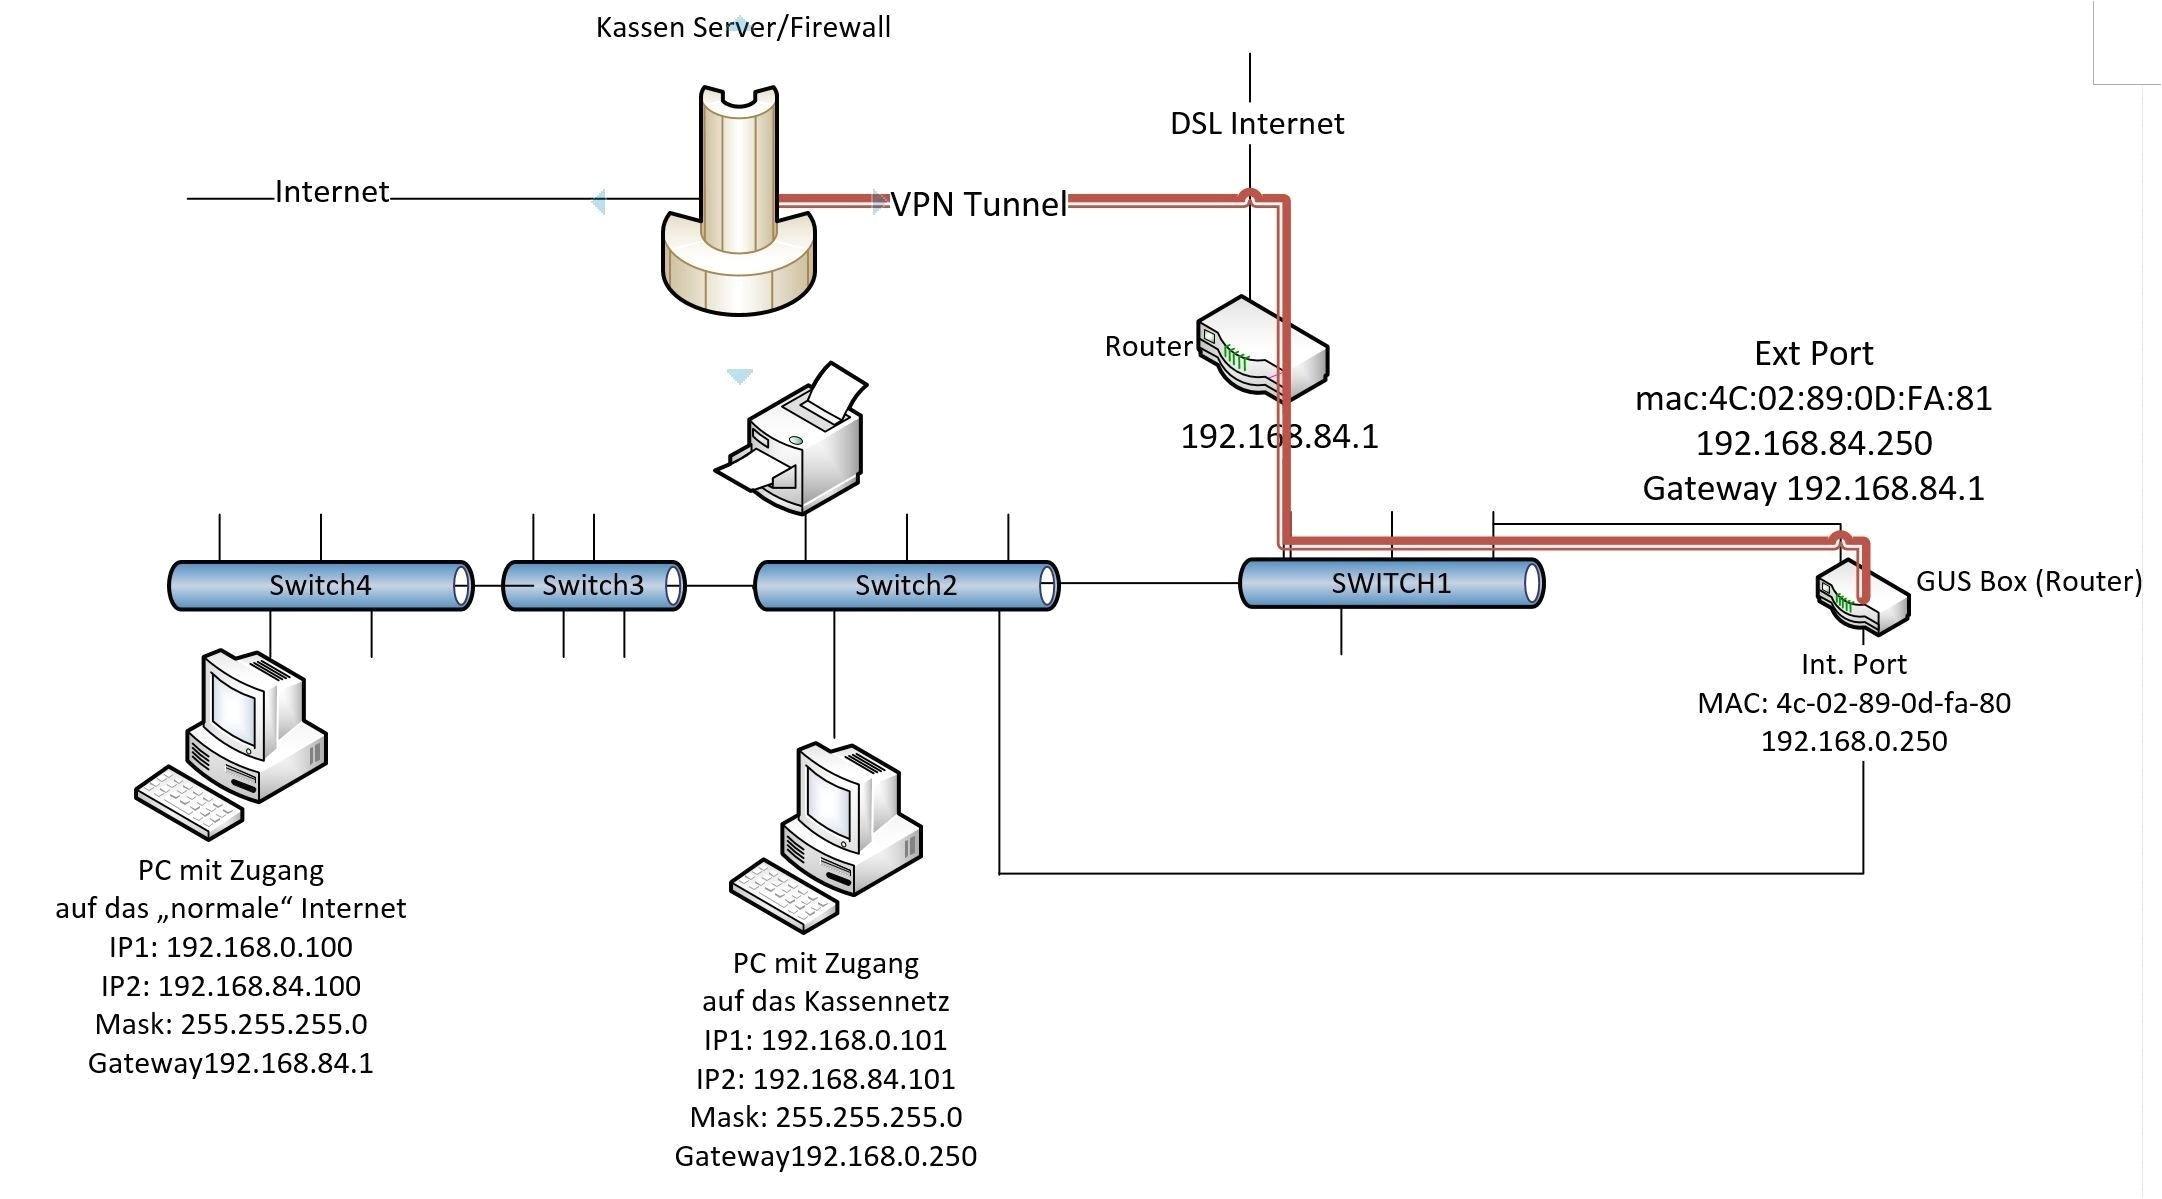 car alarm wiring diagram product wiring diagram files alarm auto watch diagram car wiring 280rli